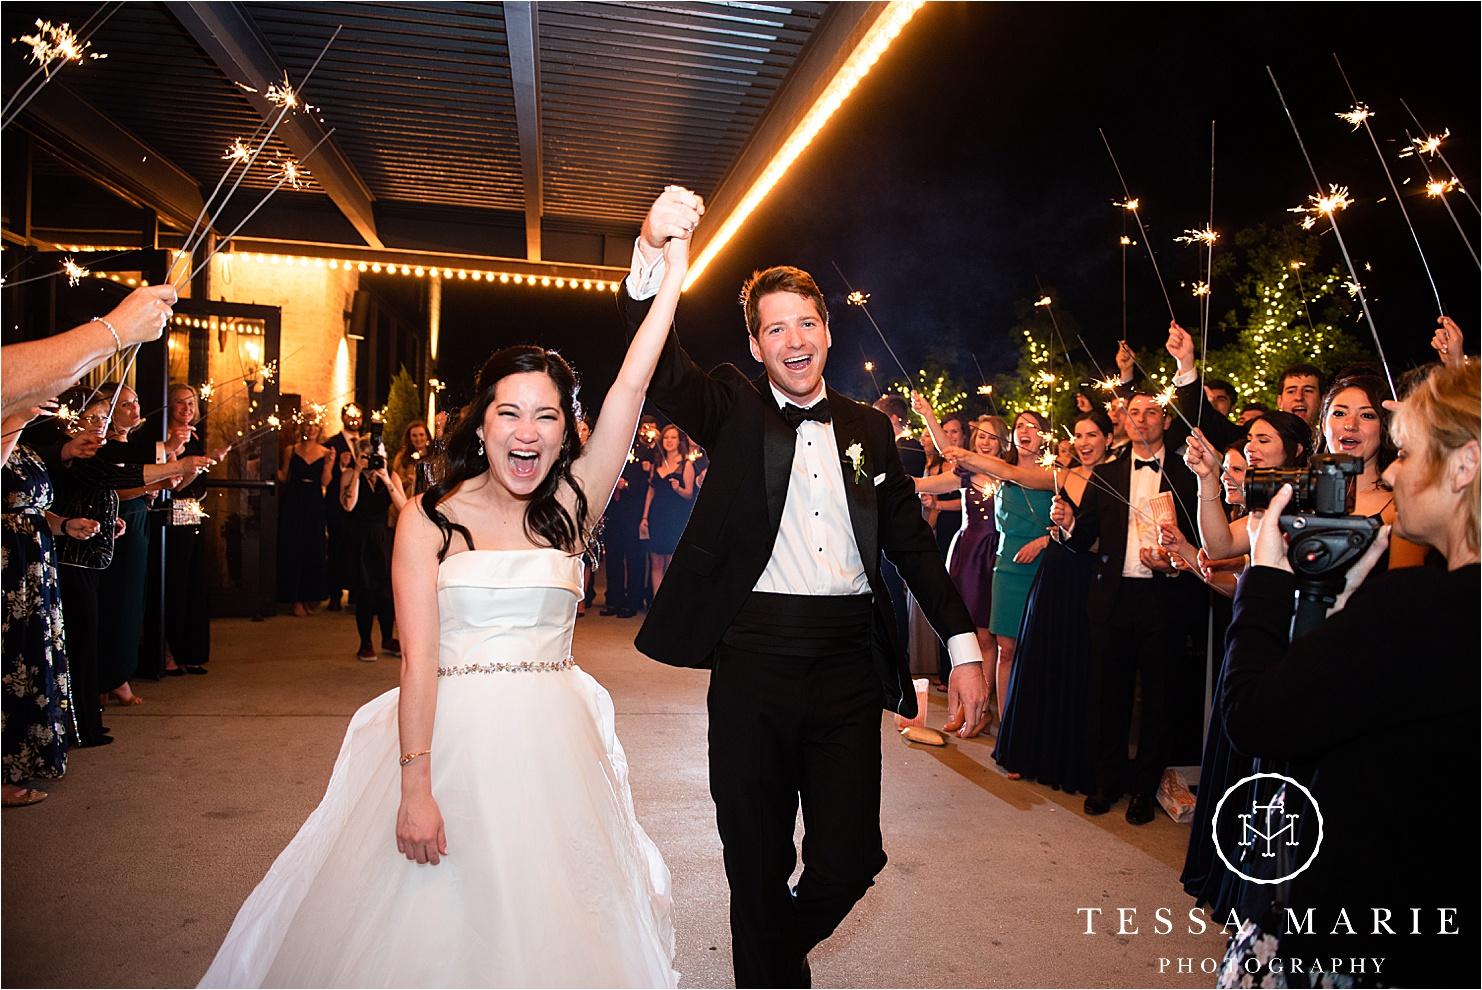 Tessa_marie_weddings_houston_wedding_photographer_The_astorian_0189.jpg